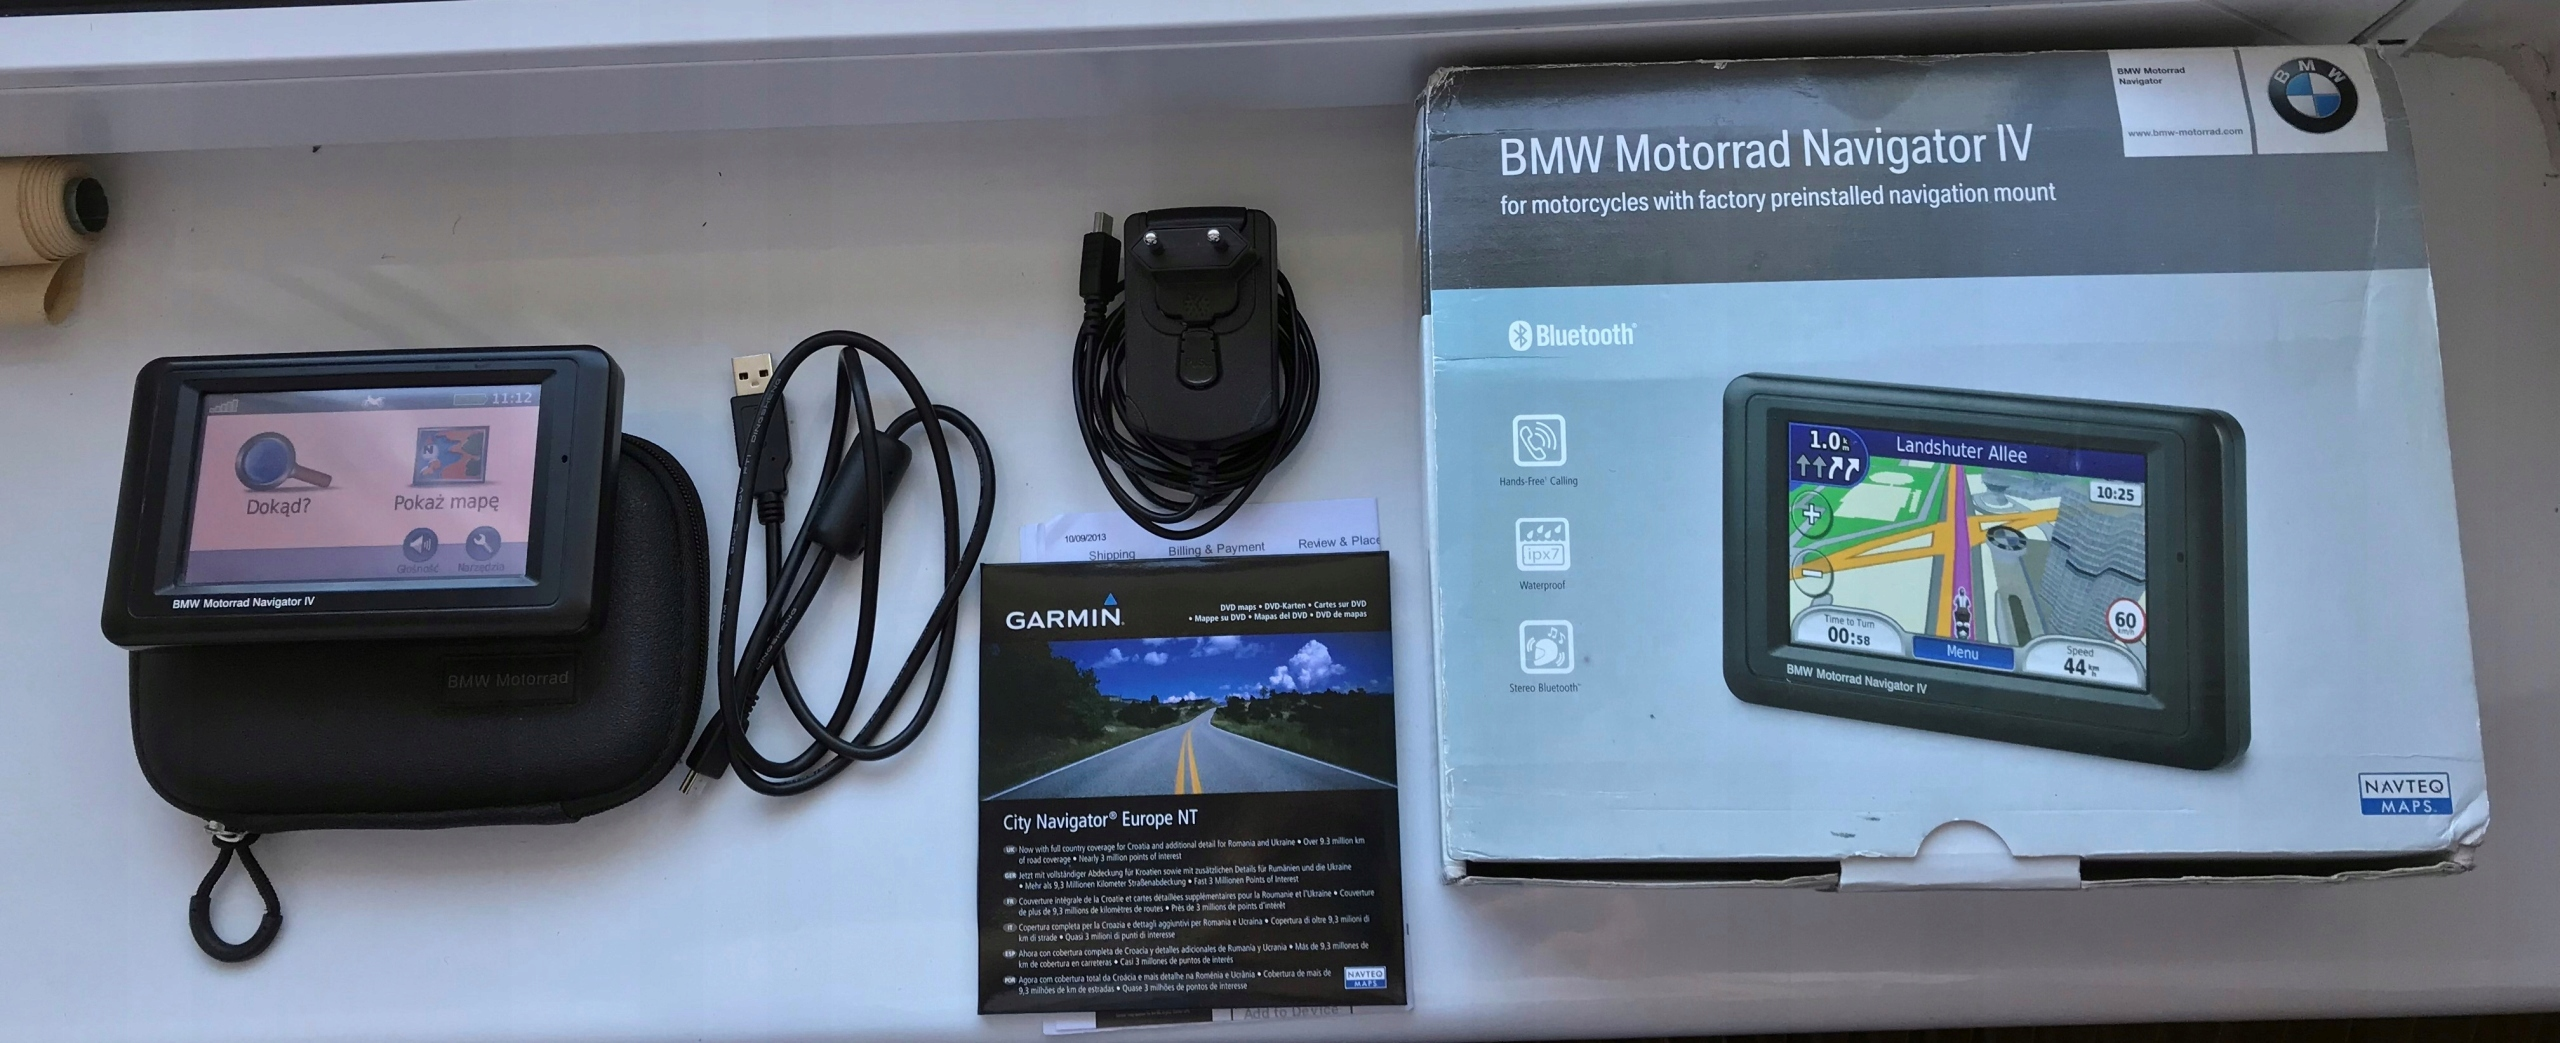 bmw navigator iv 4 jak garmin zumo 550 nawigacja. Black Bedroom Furniture Sets. Home Design Ideas